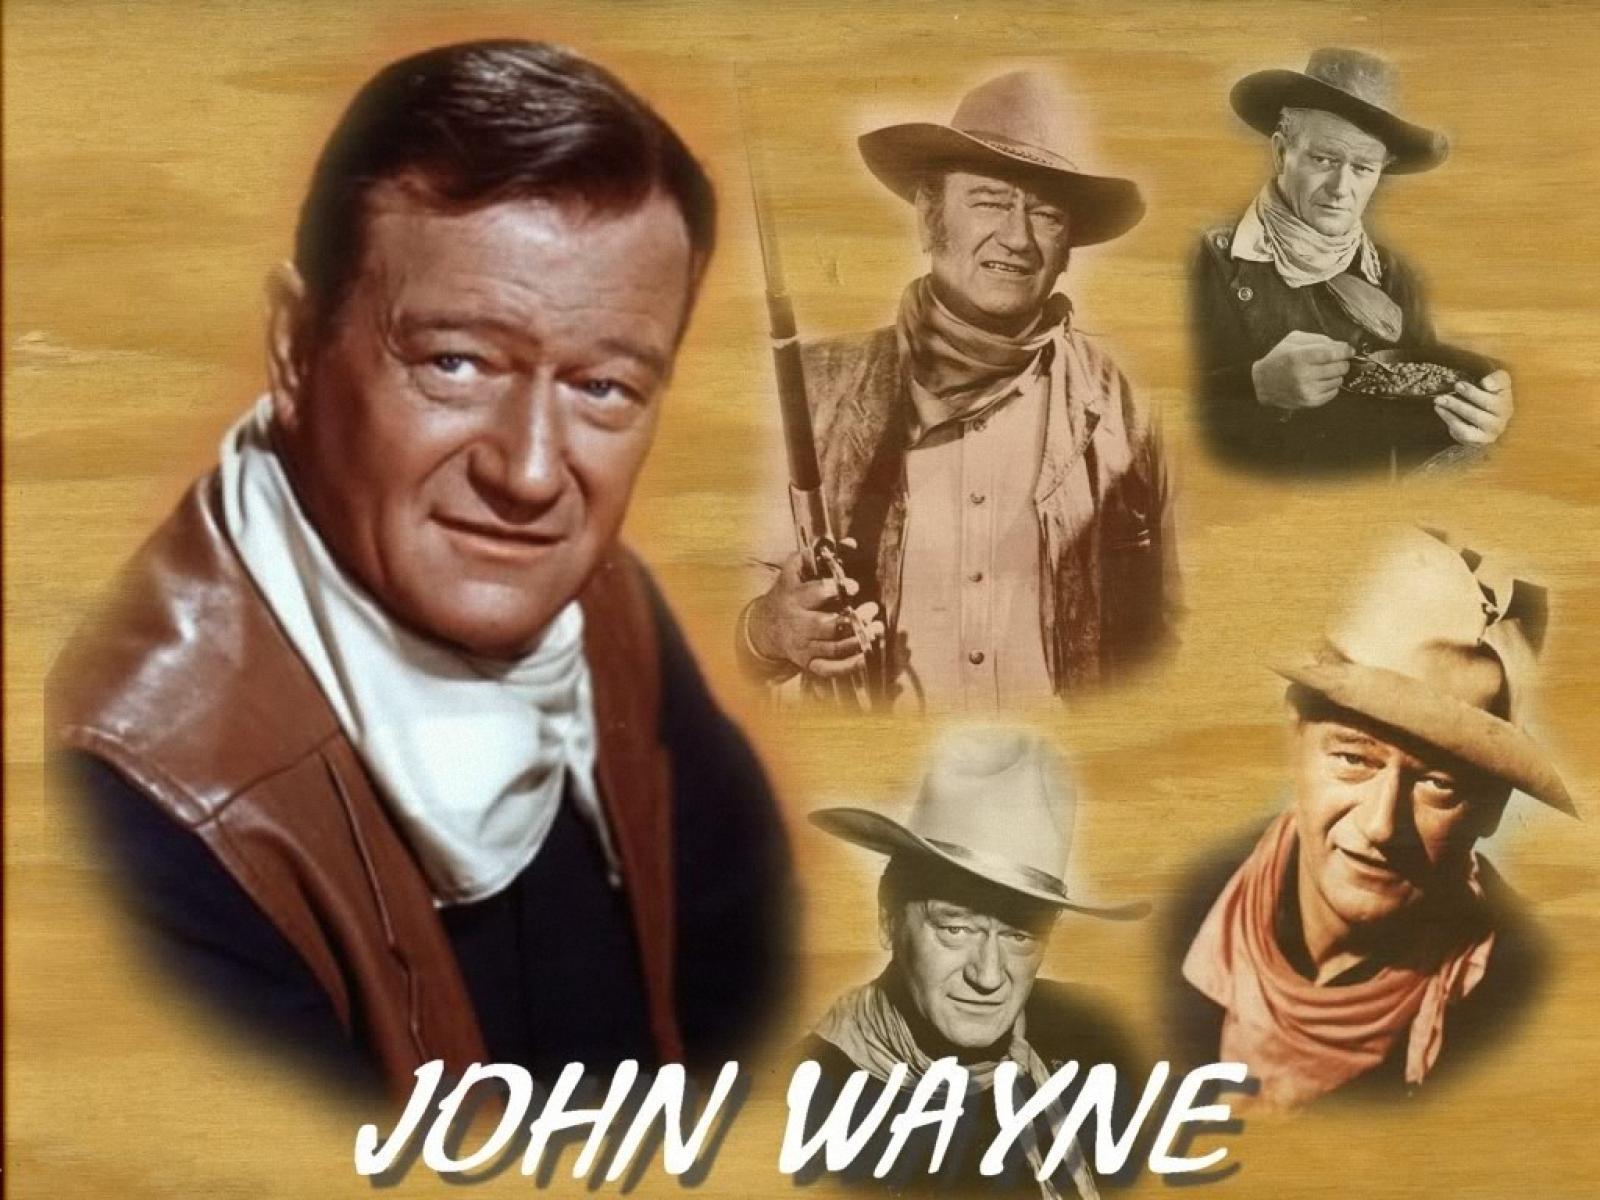 49] John Wayne Wallpaper 1680x1050 on WallpaperSafari 1600x1200